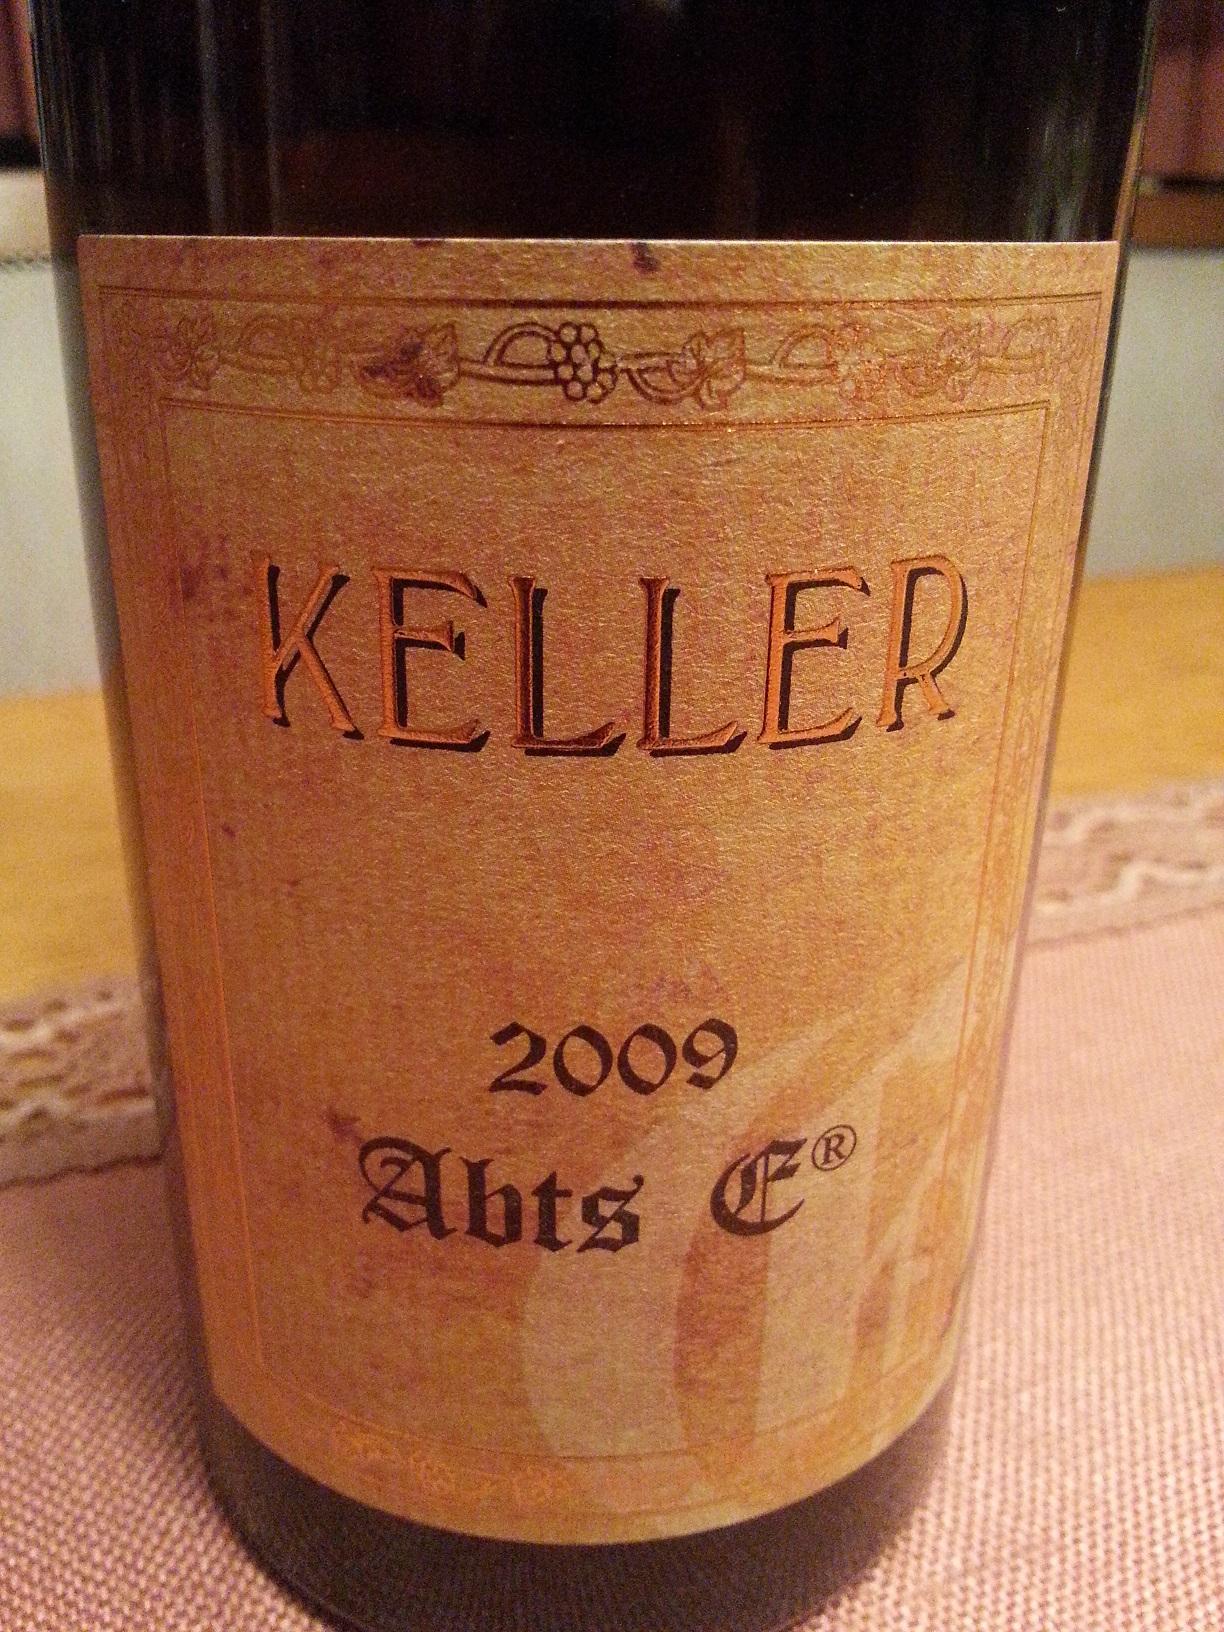 2009 Abts-E | Keller